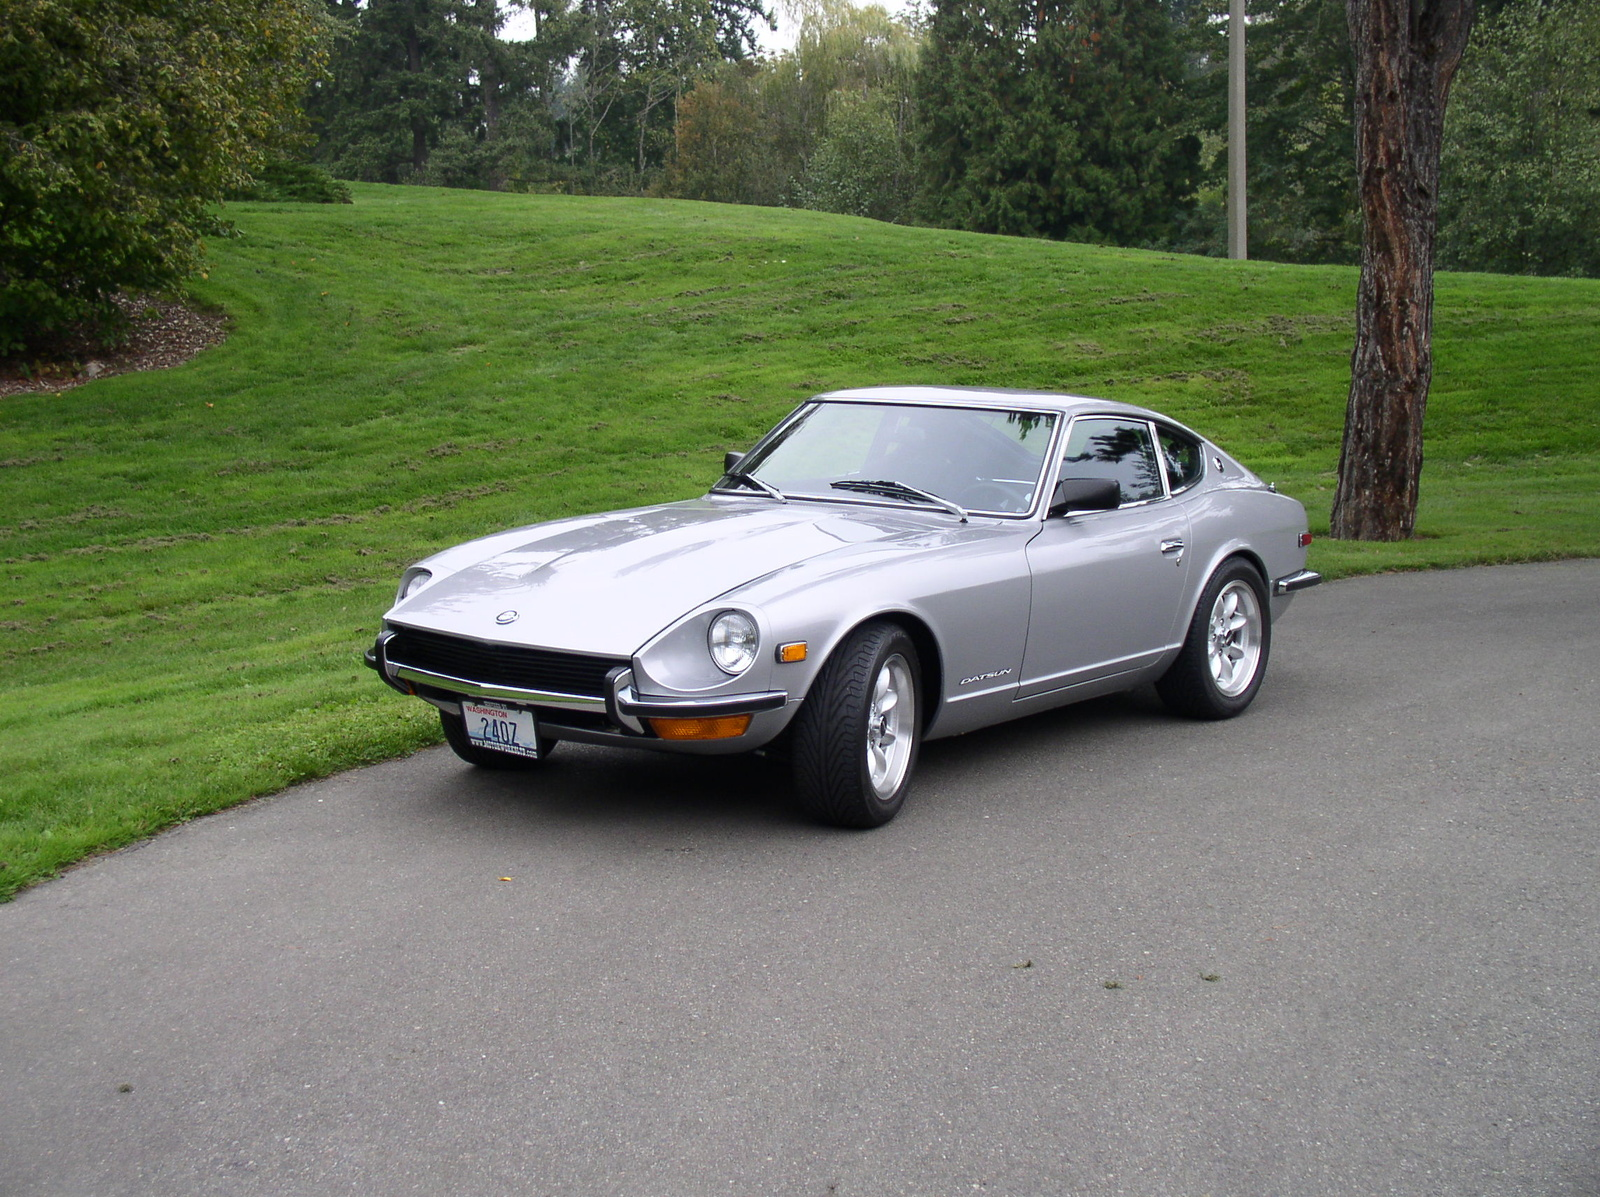 1970 Datsun 240z Pictures Cargurus